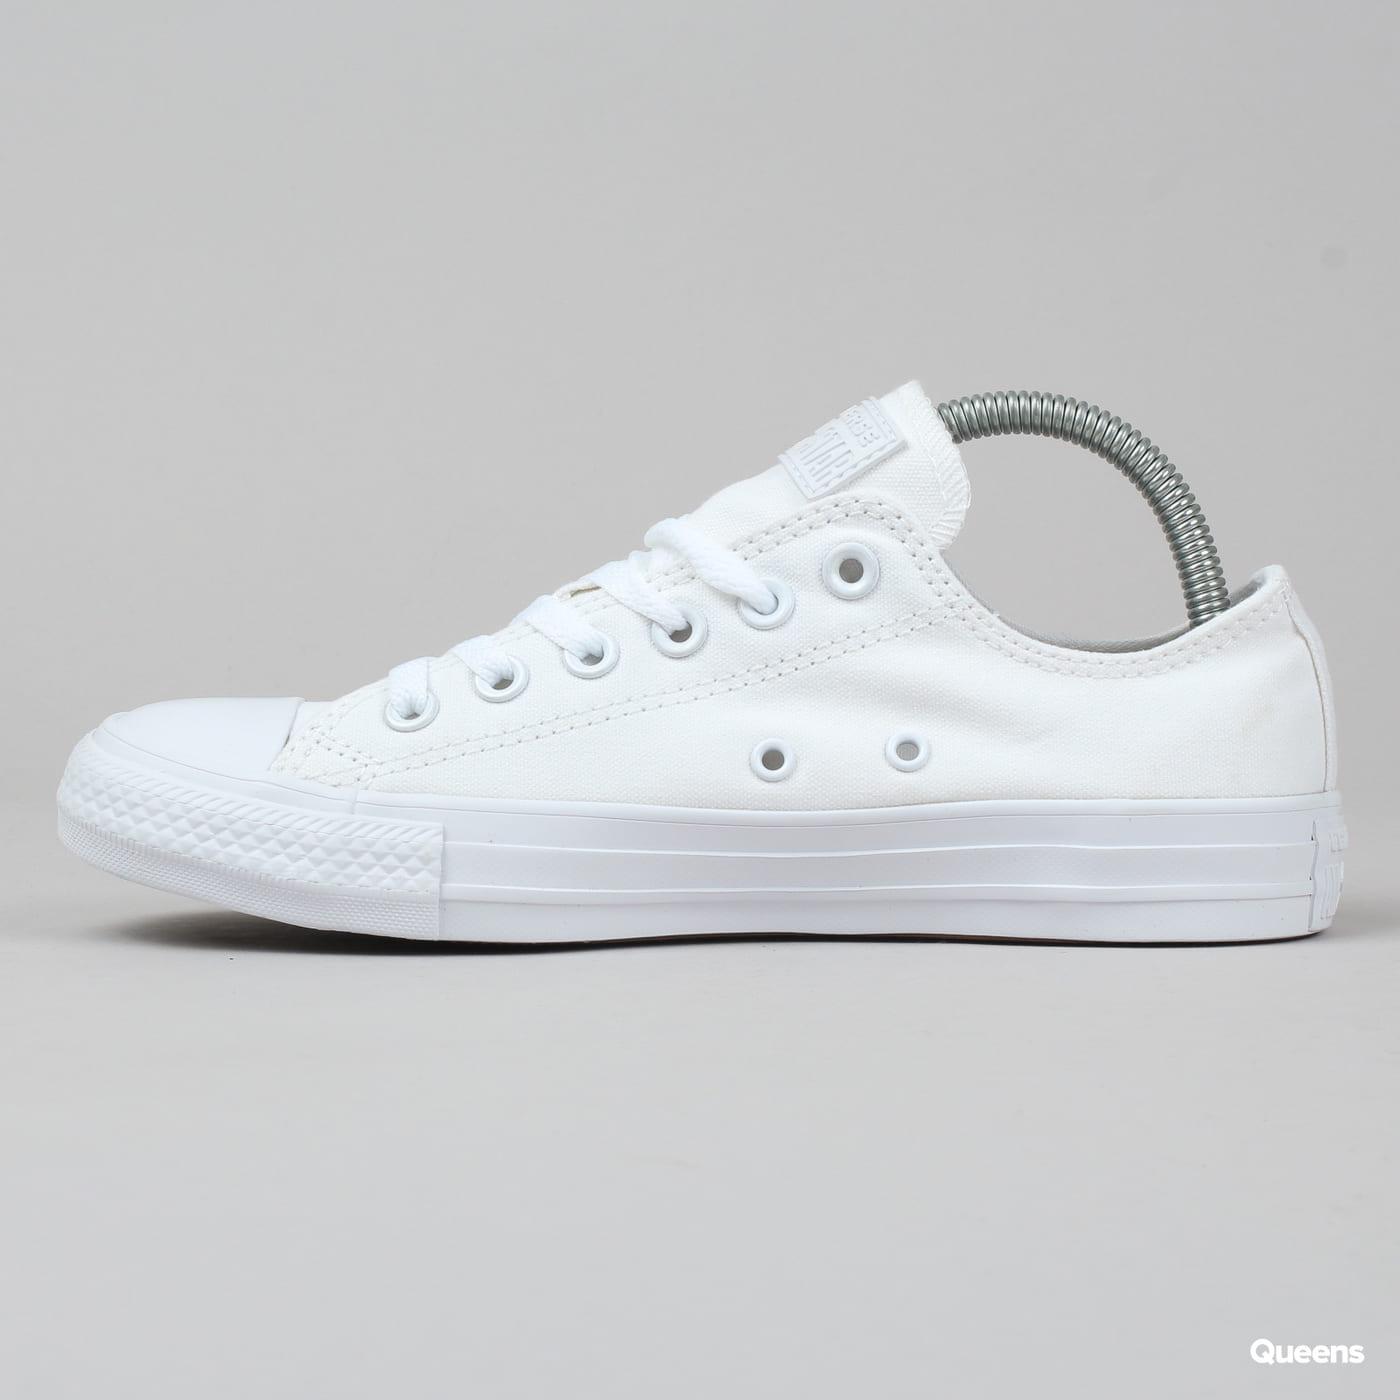 Converse Chuck Taylor All Star Seasonal white monoch